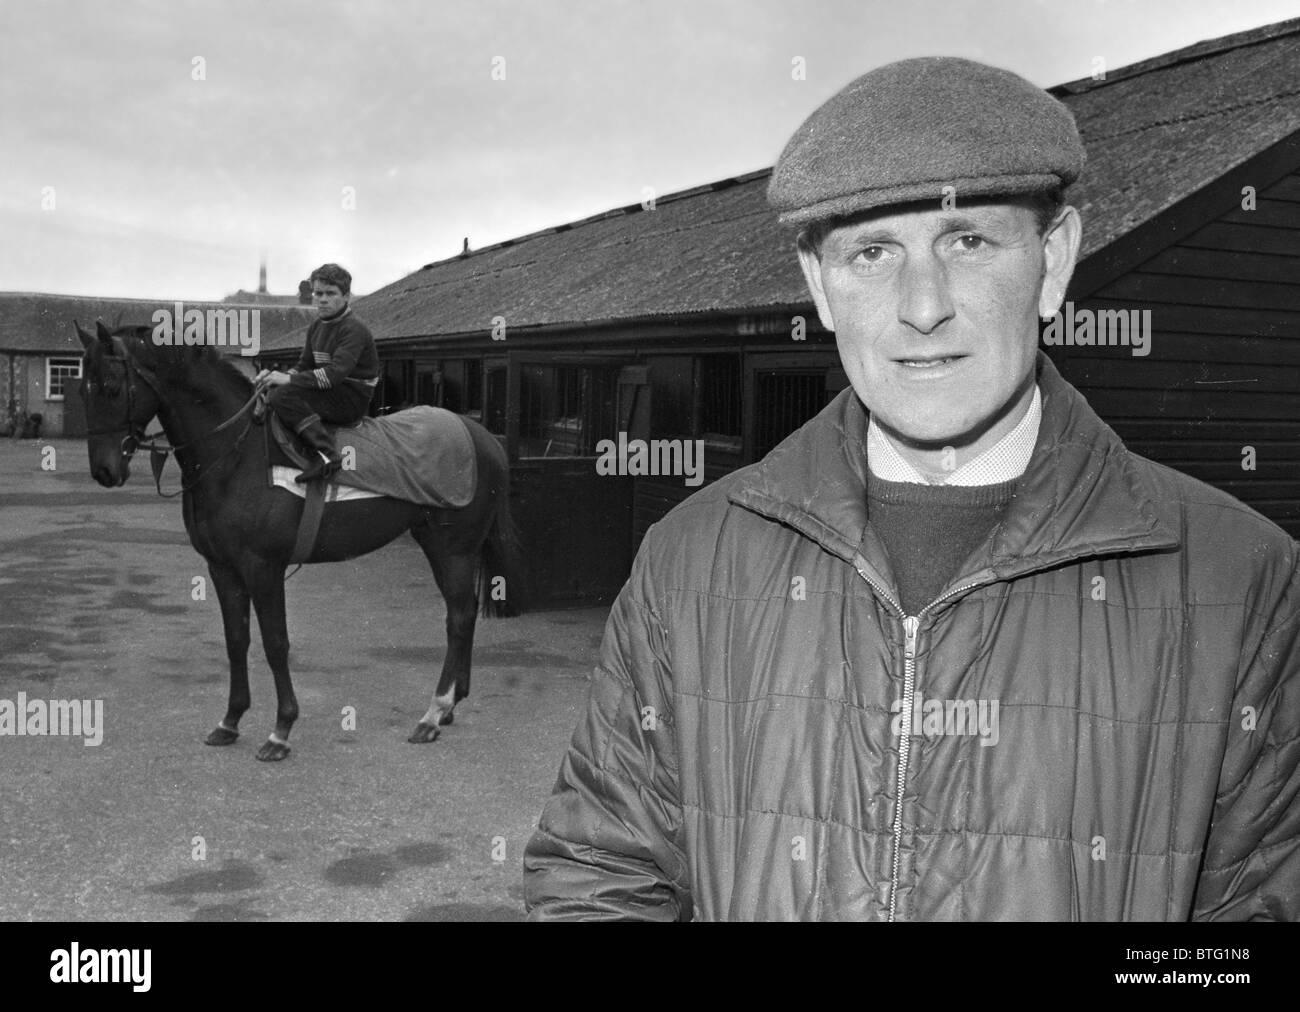 John Dunlop Racehorse Trainer Castle Stables Arundel, West Sussex England. - Stock Image